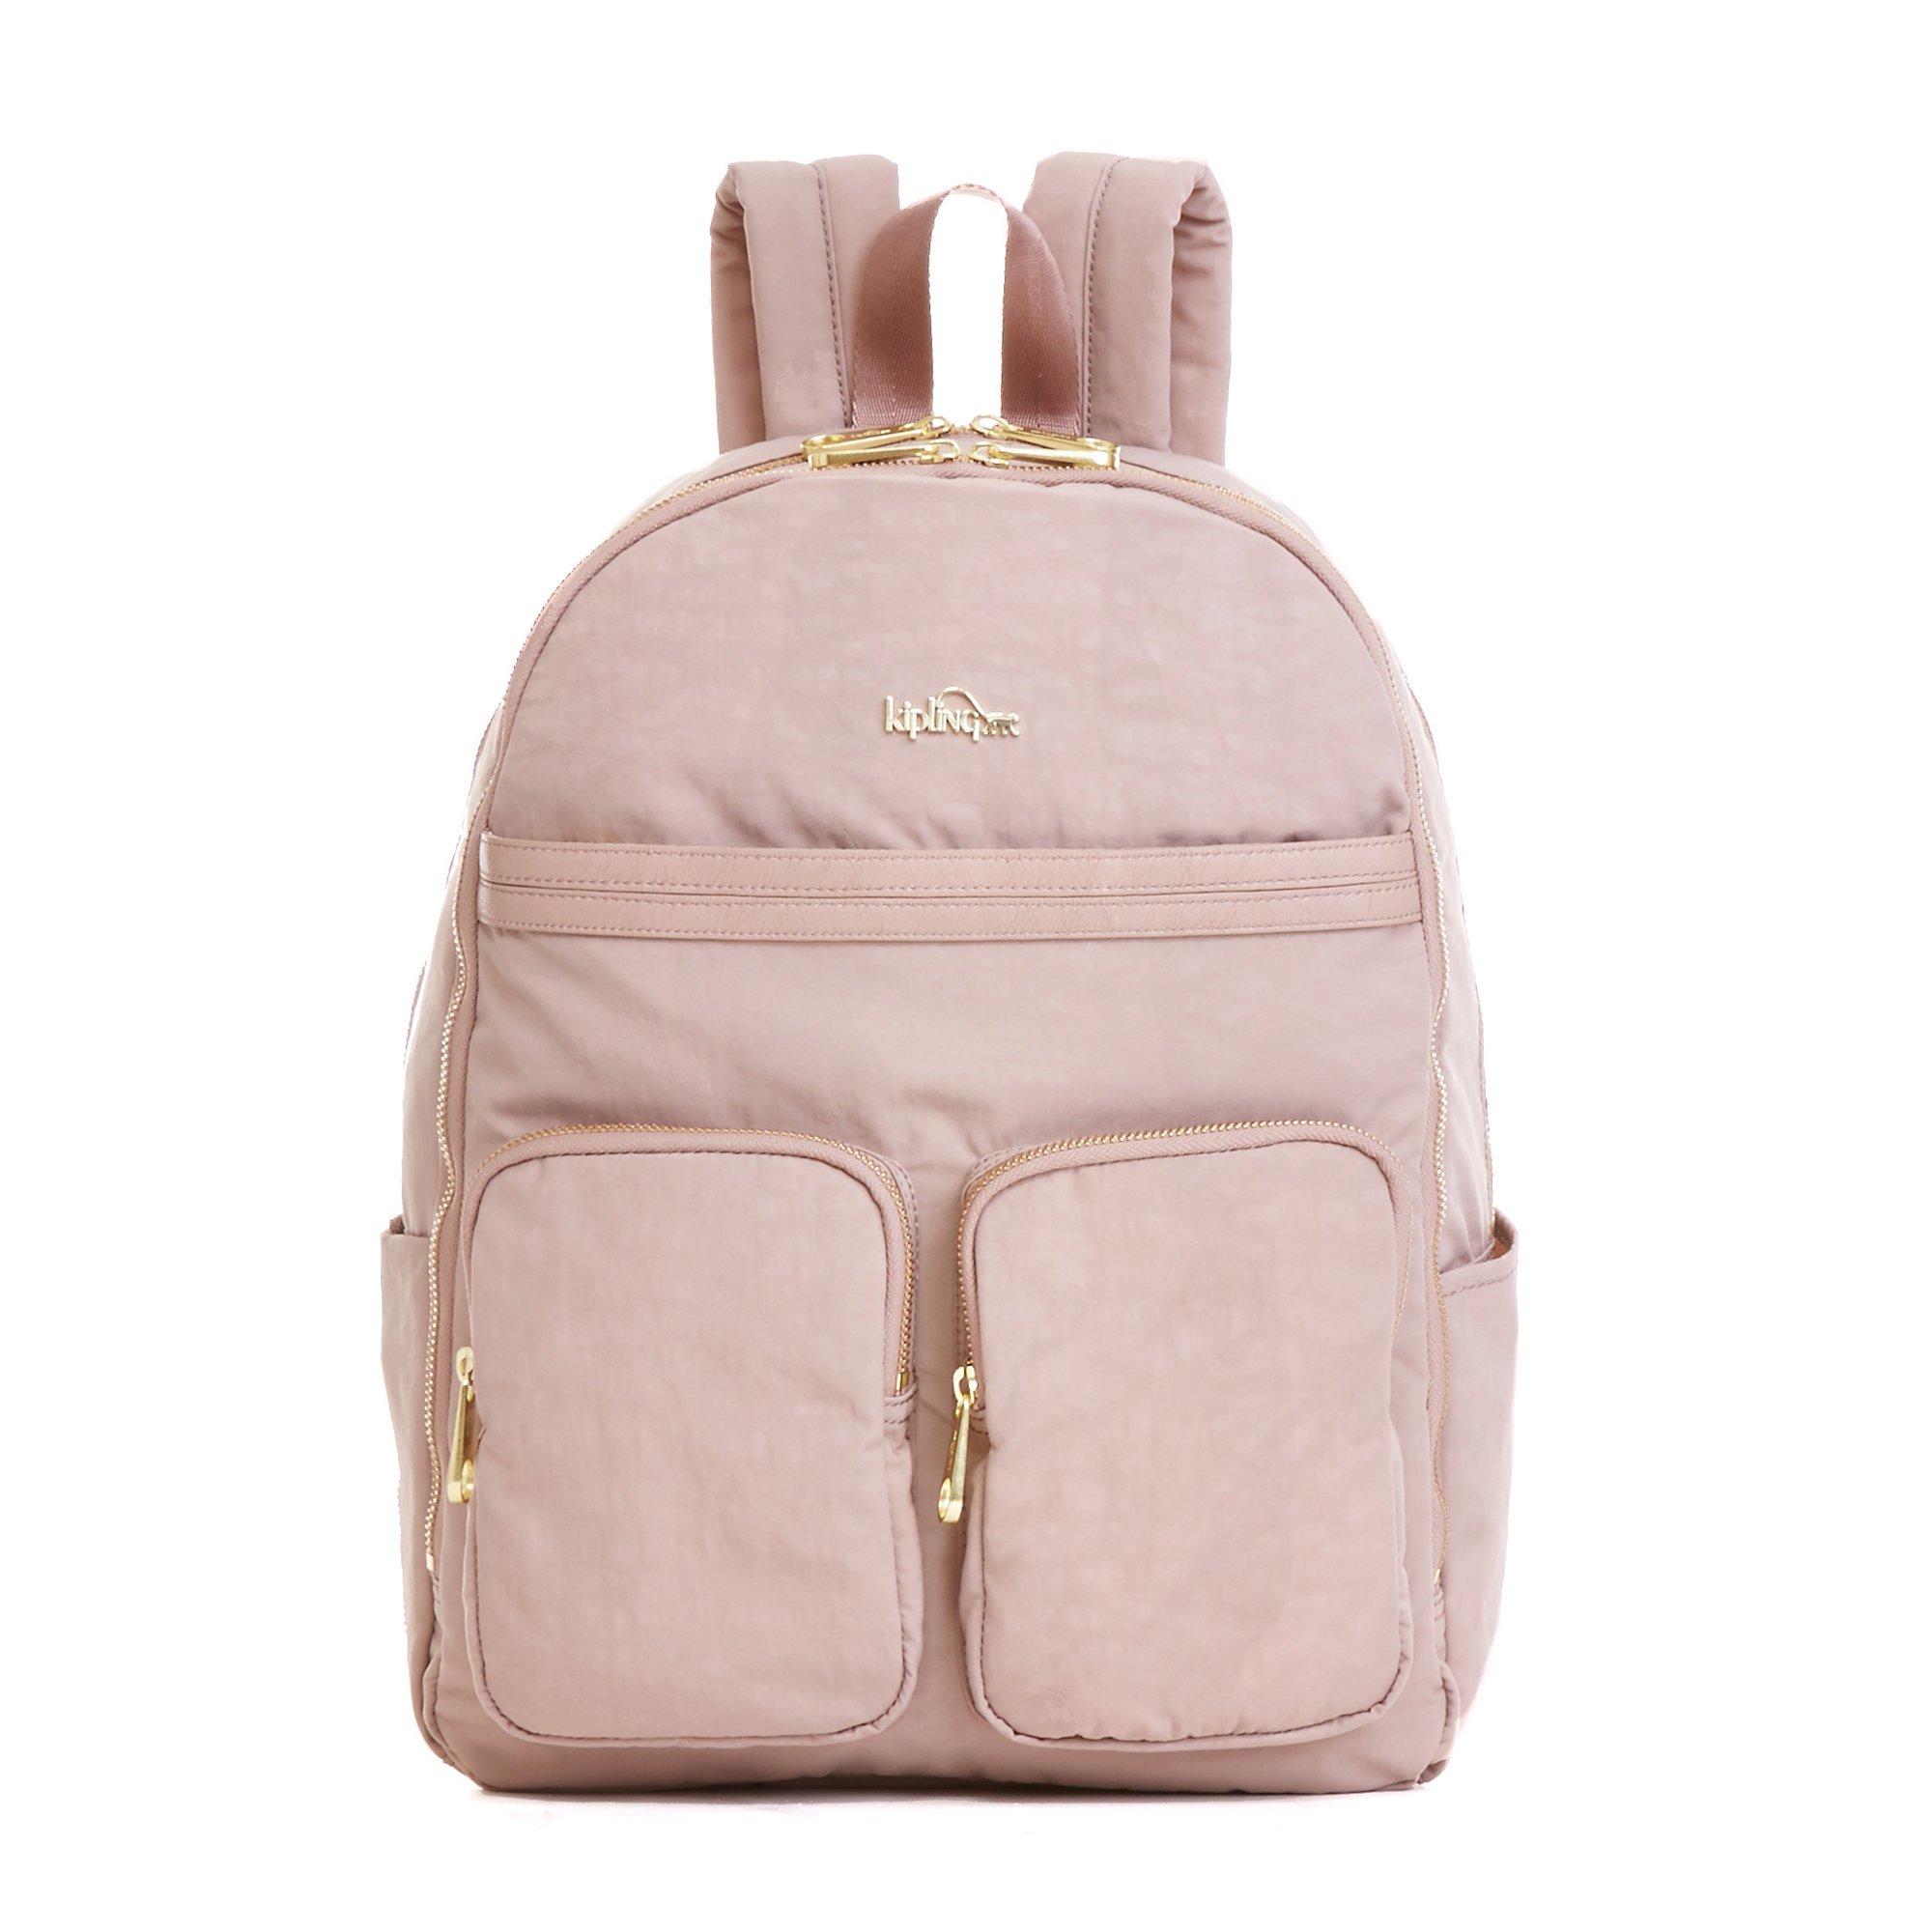 Kipling Women's Tina Large Laptop Backpack One Size Antique Rose Combo